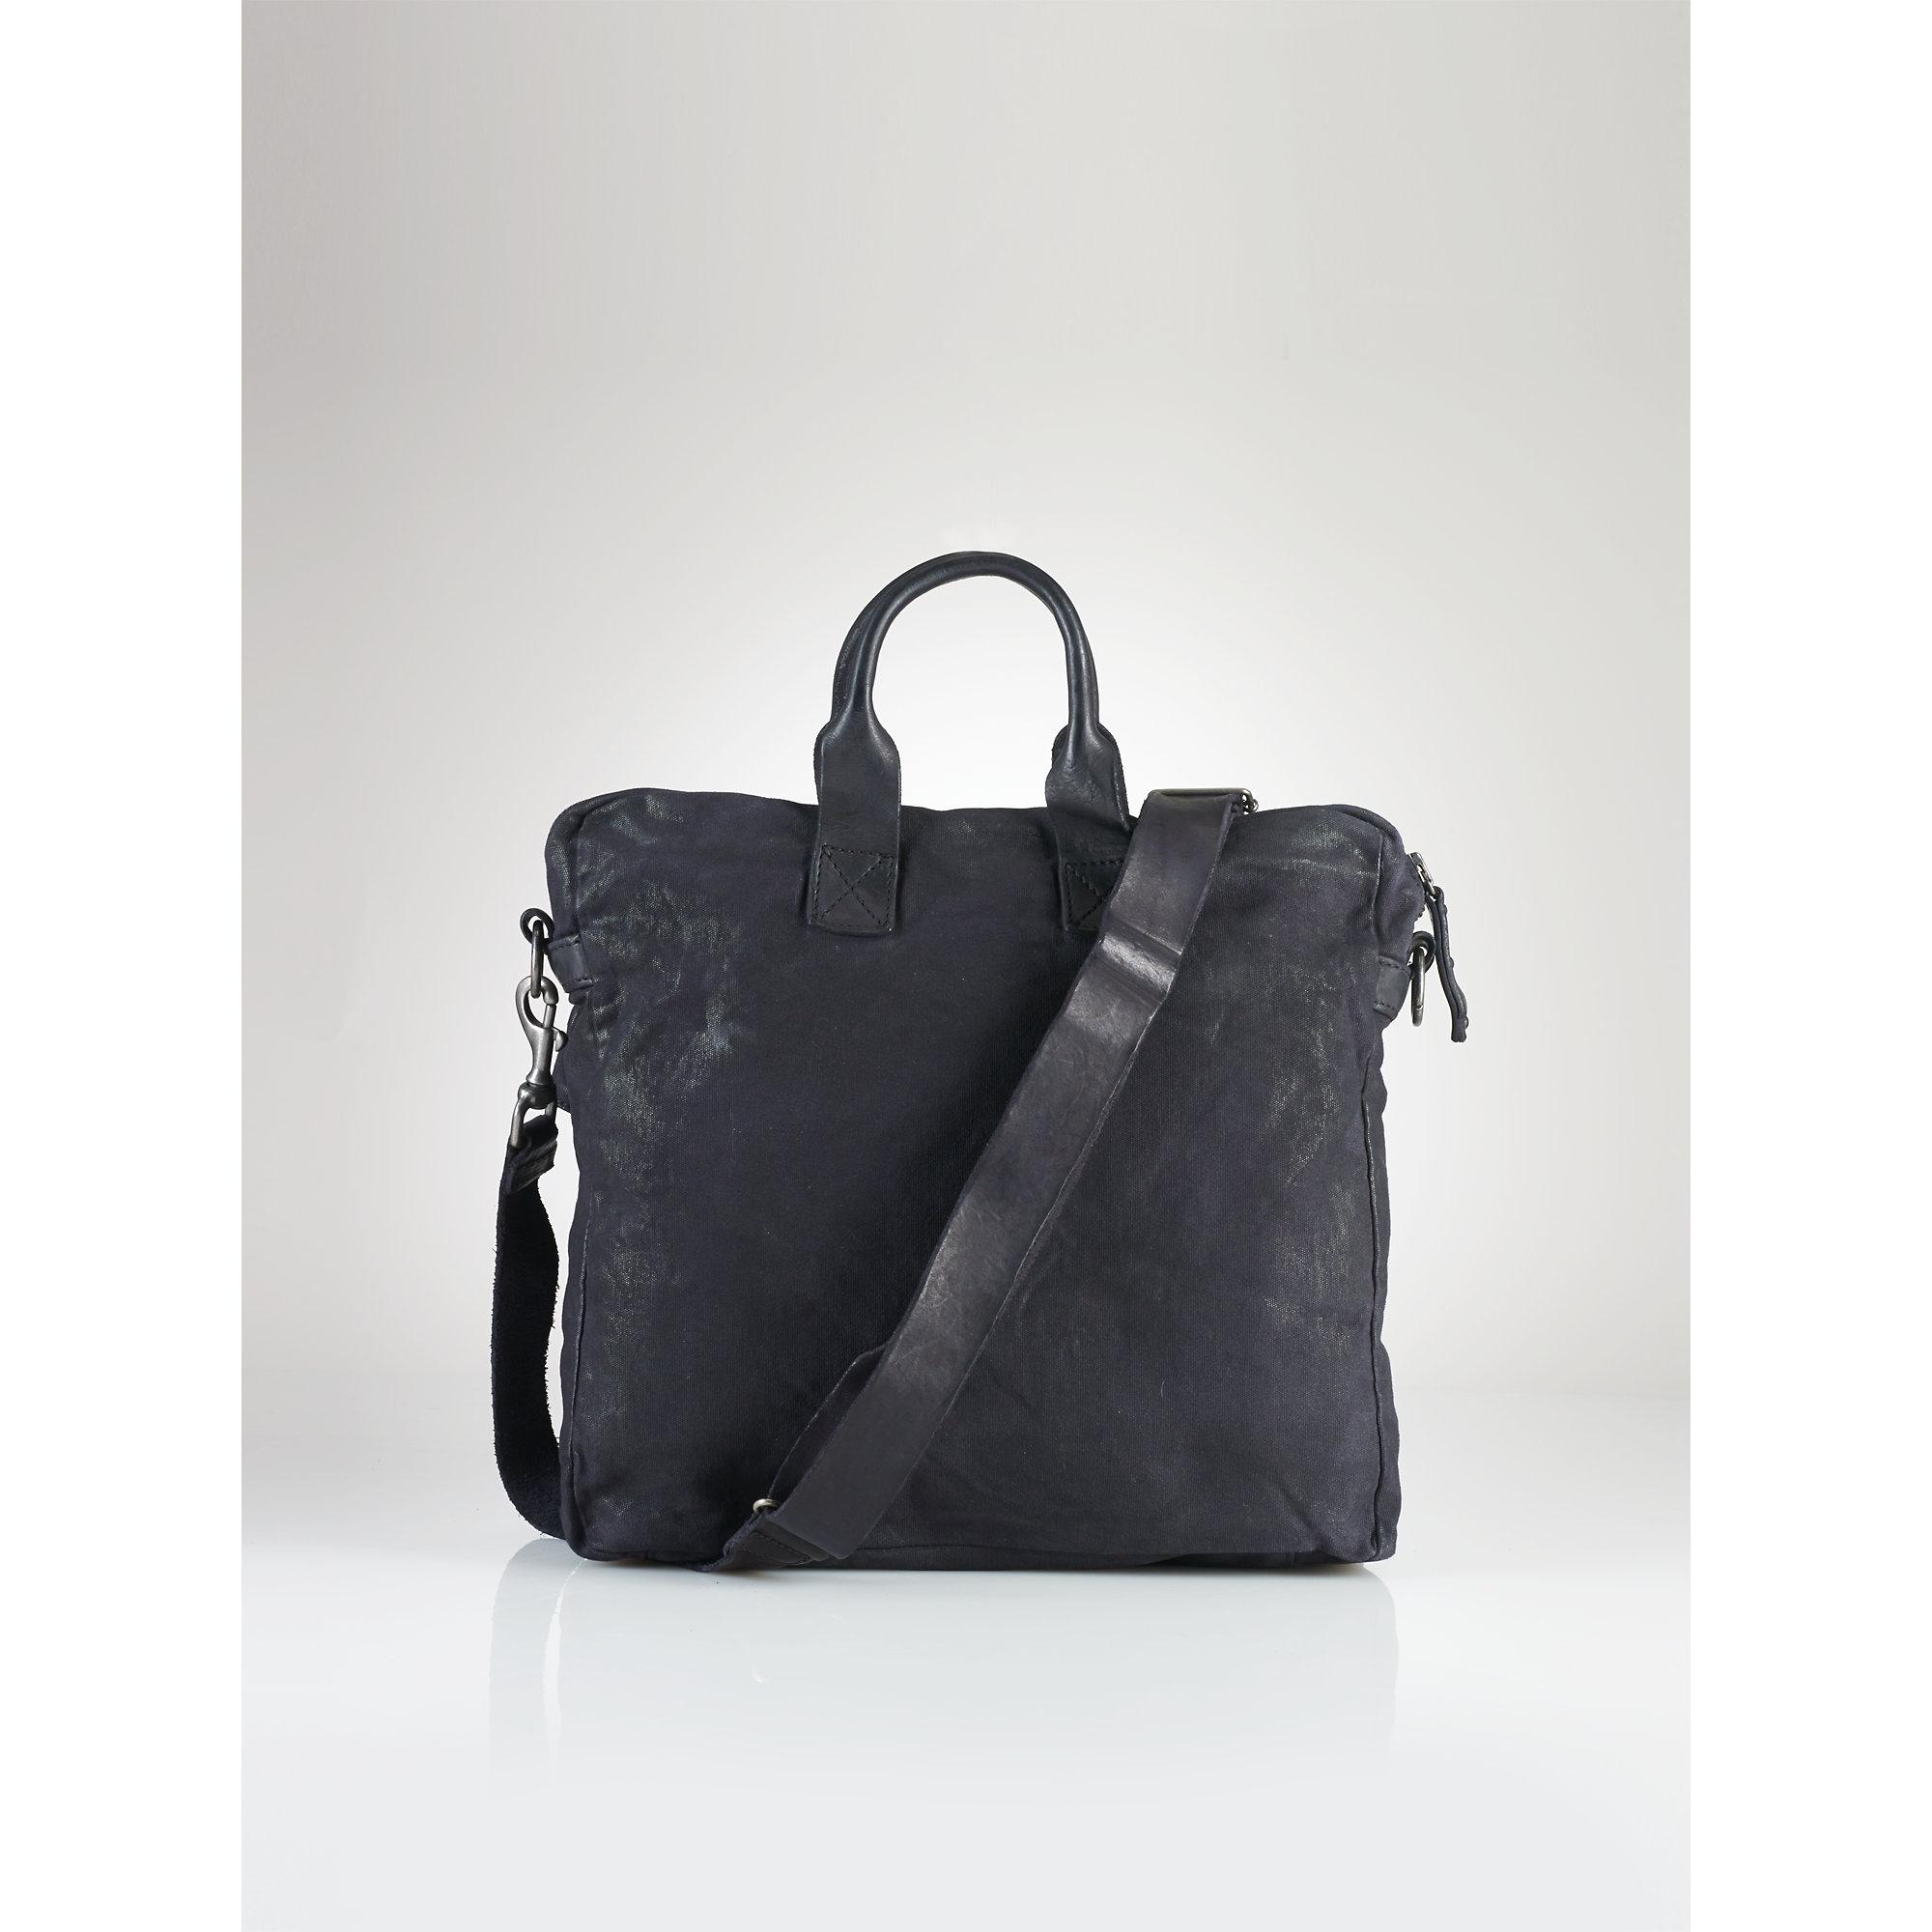 1e3aeb7c55 Lyst - Polo Ralph Lauren Canvas-Leather Messenger Bag in Black for Men